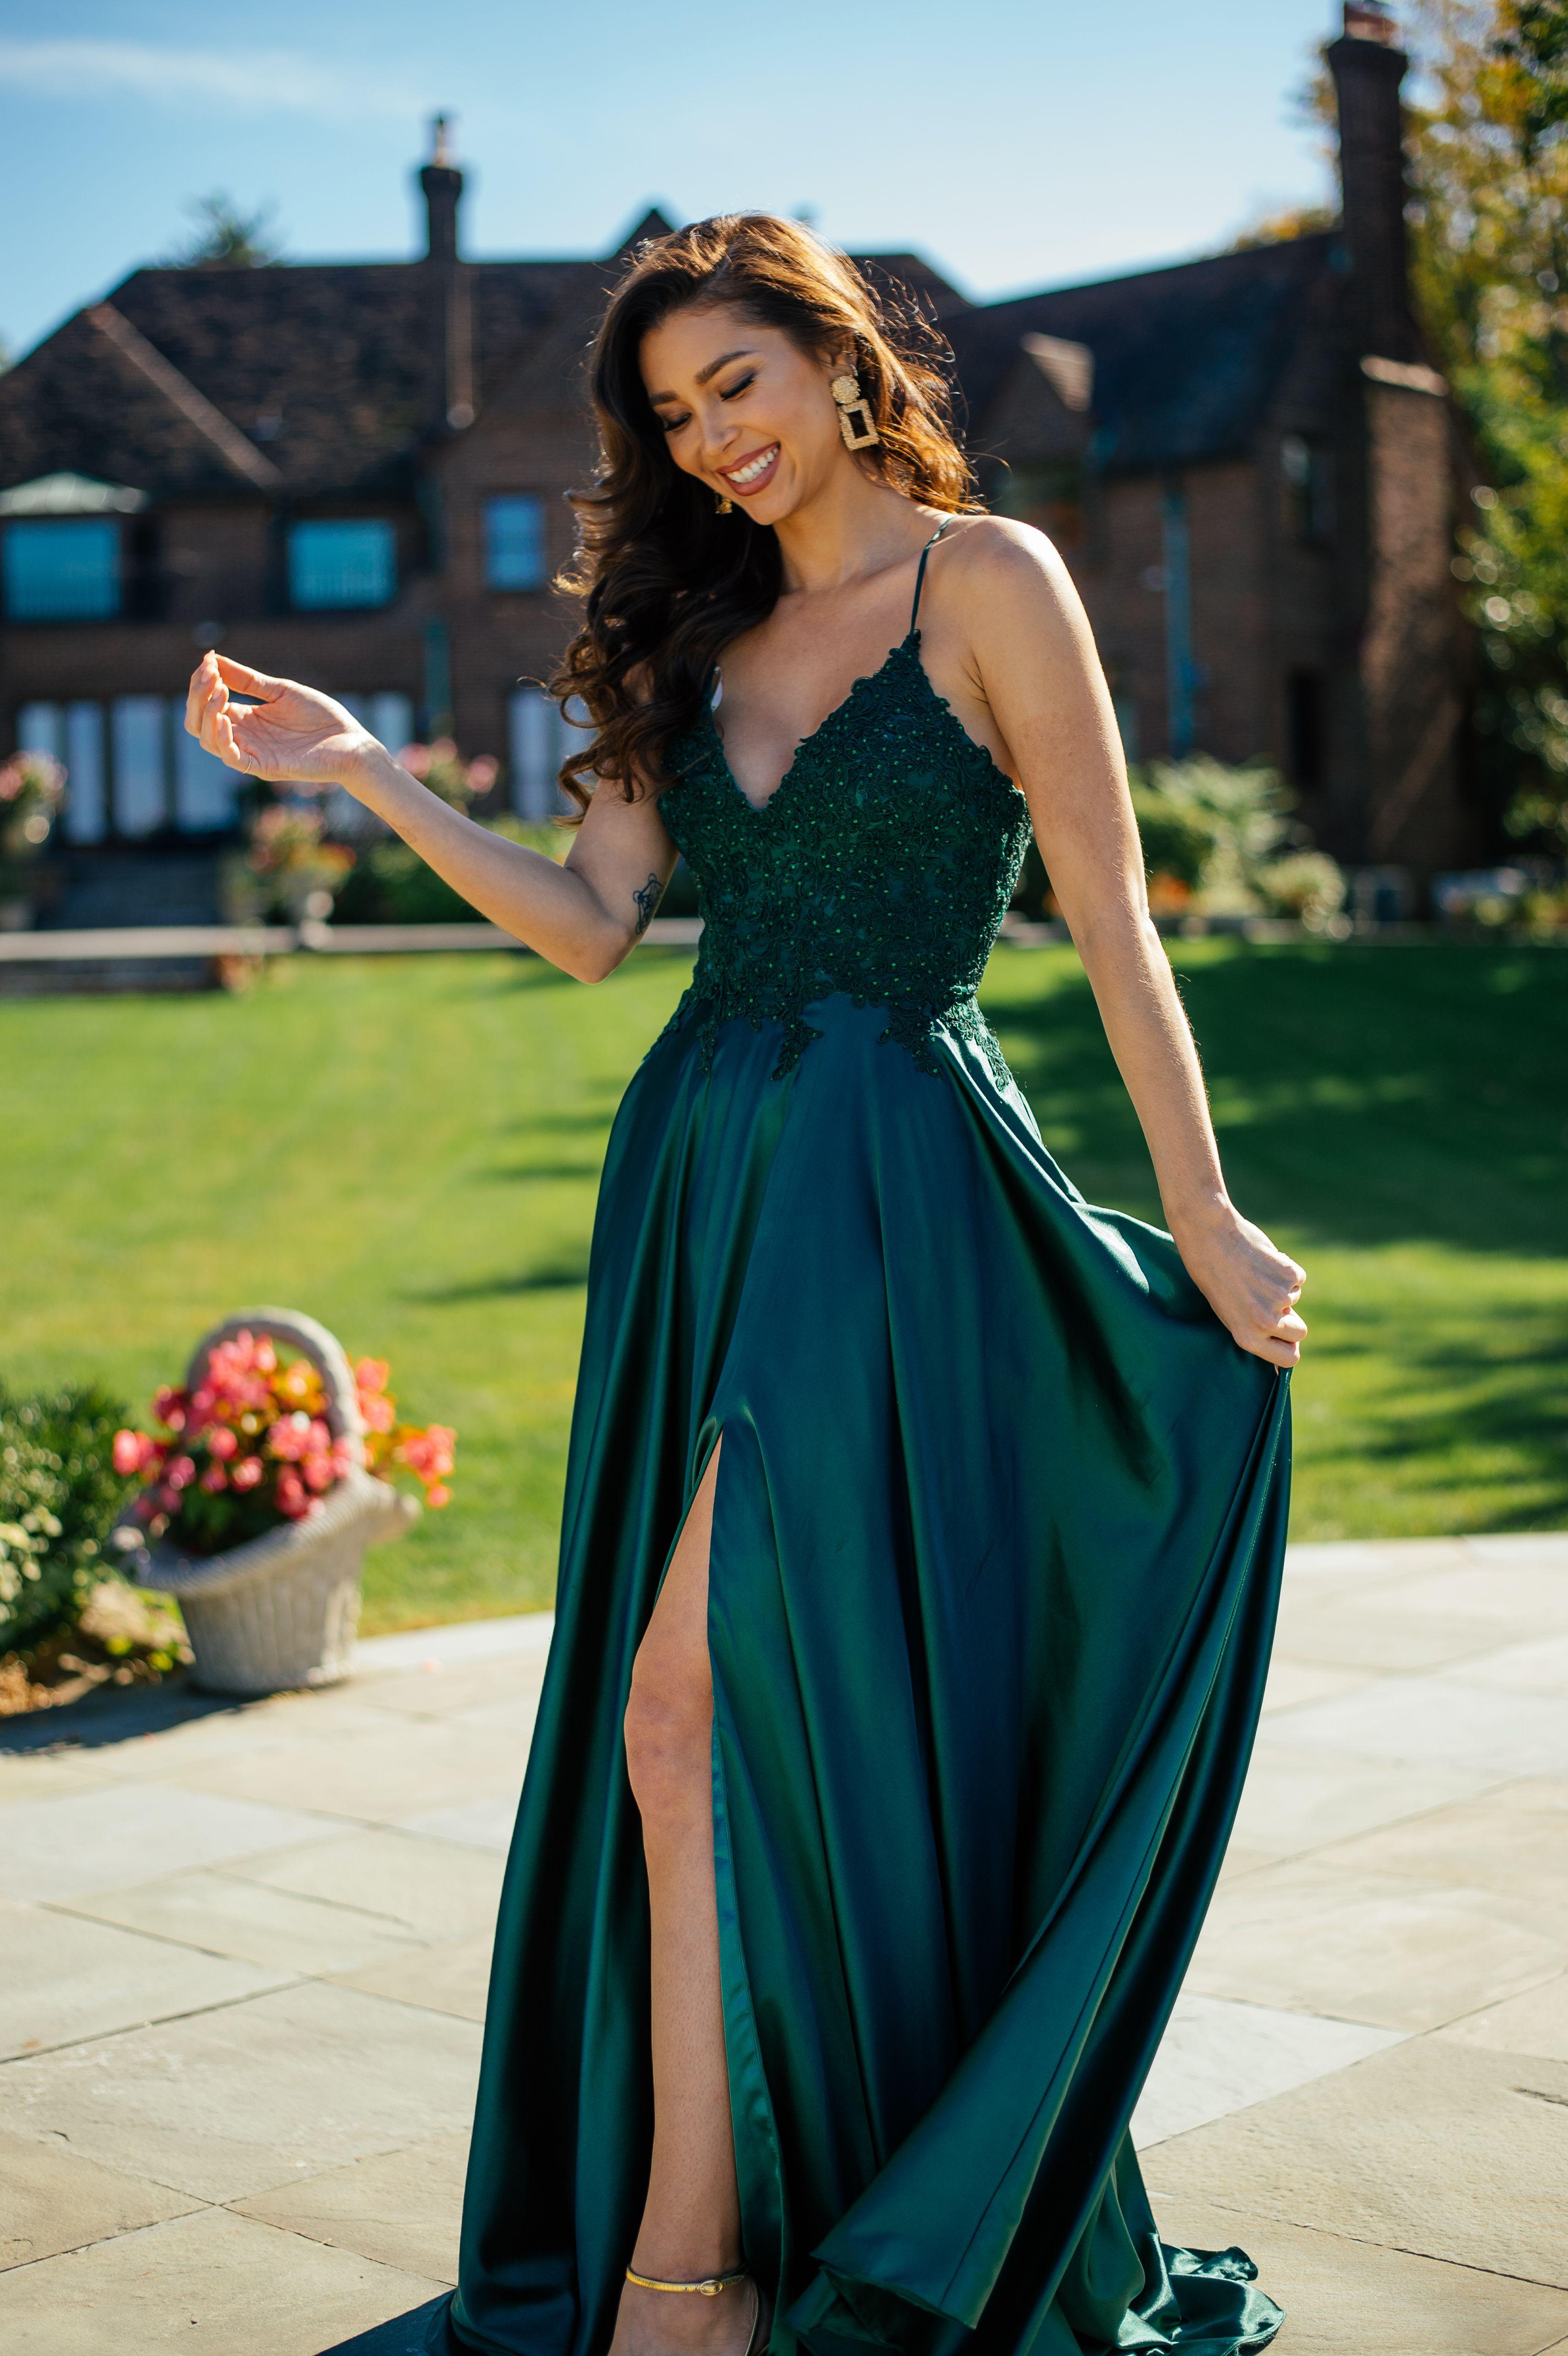 Faviana S 10400 Prom Dresses Trendy Prom Dresses Cute Prom Dresses [ 4928 x 3280 Pixel ]